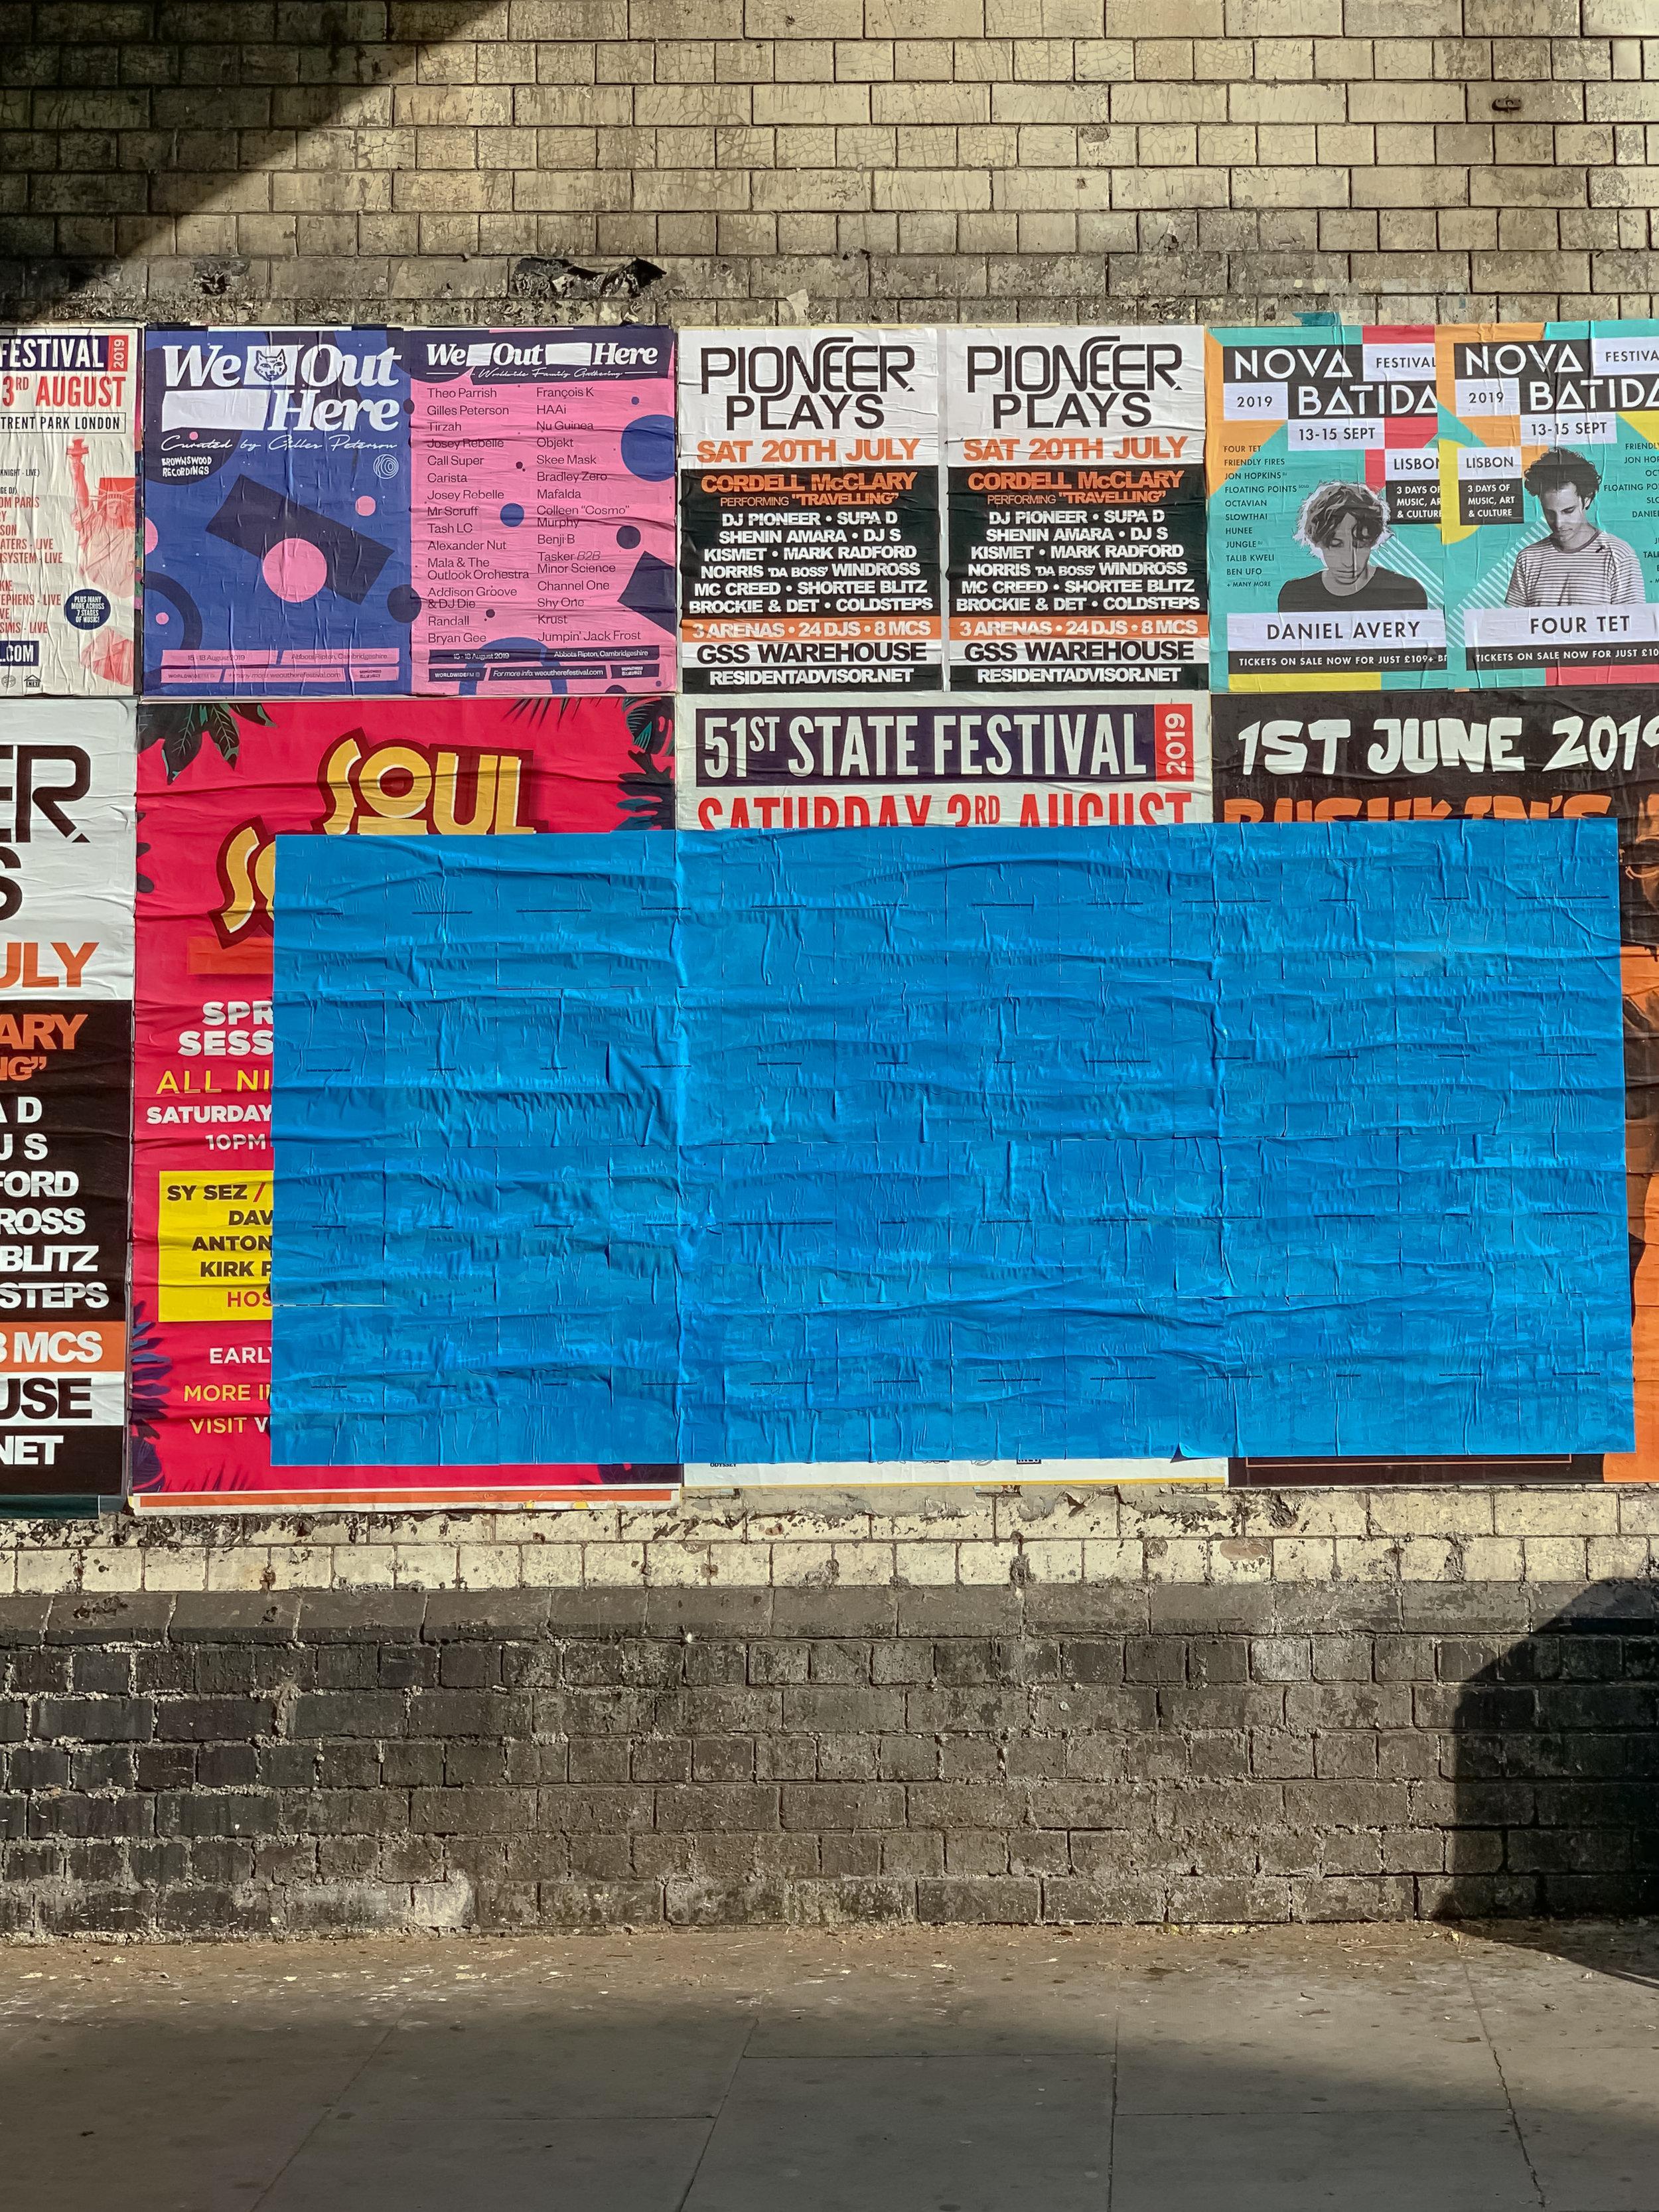 Visual Poetry Series. Public Space. (2019) (2.5m x 1.2m)